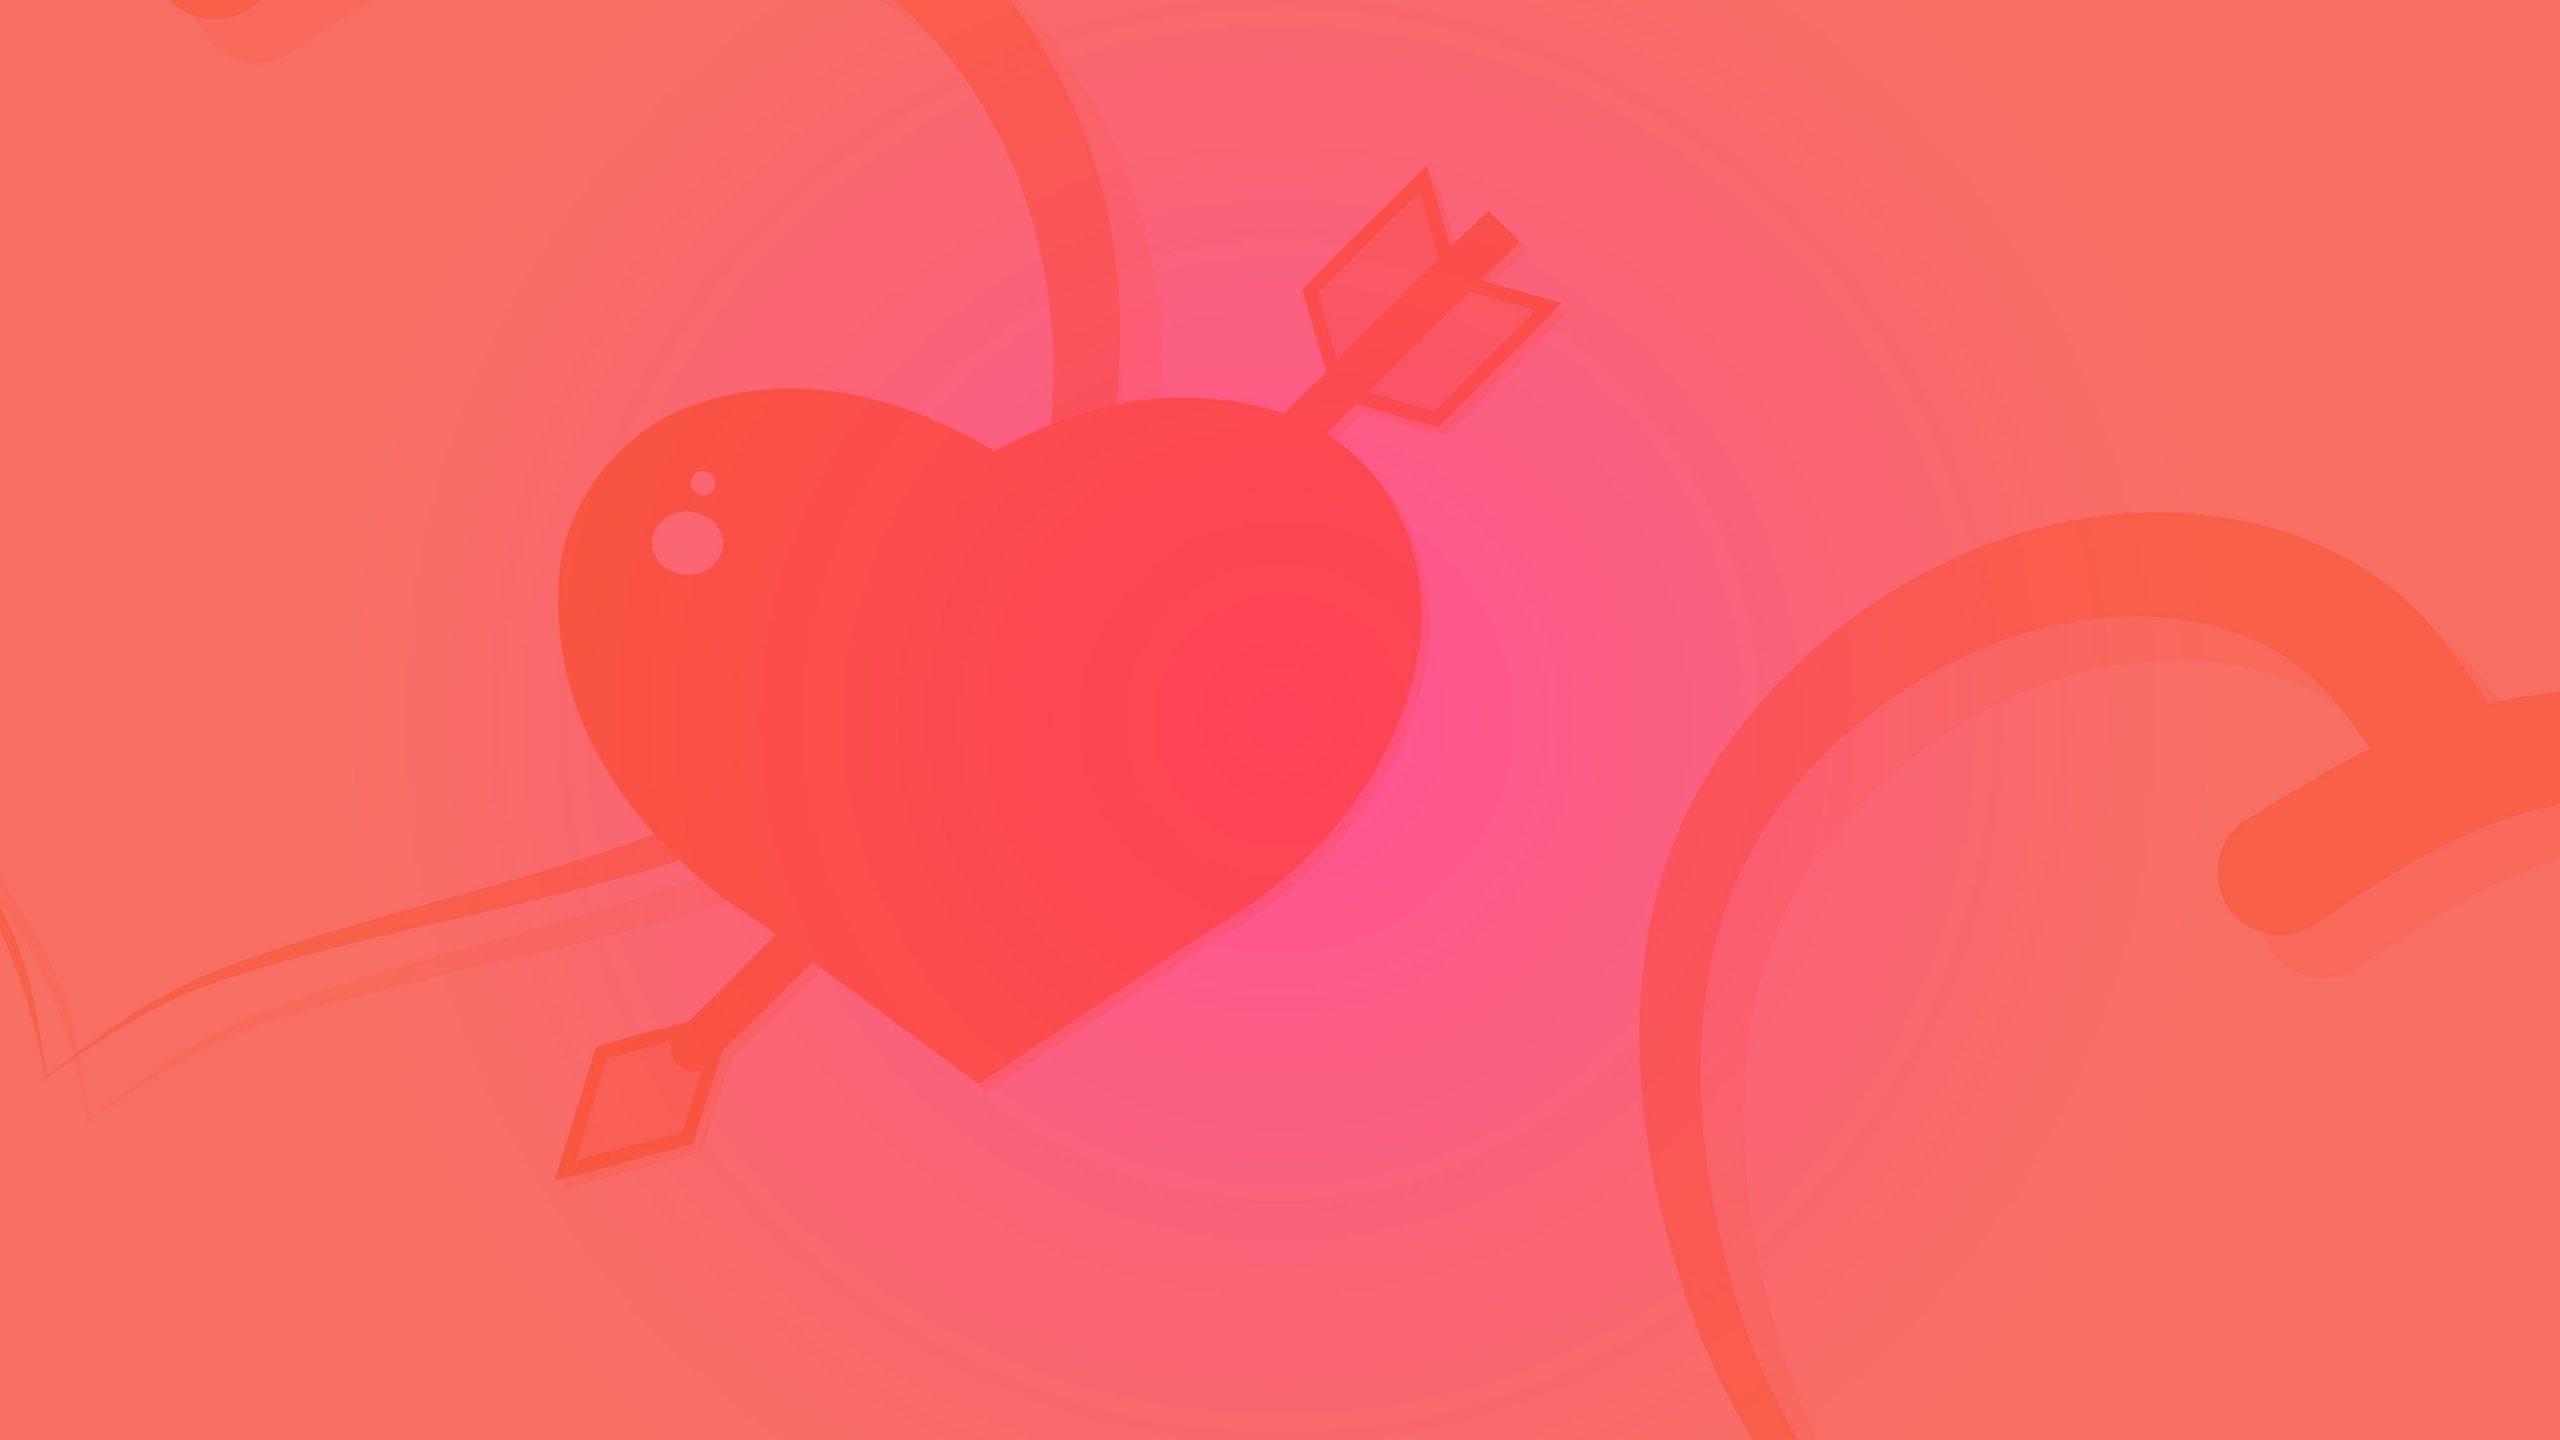 Heart shape wallpaper